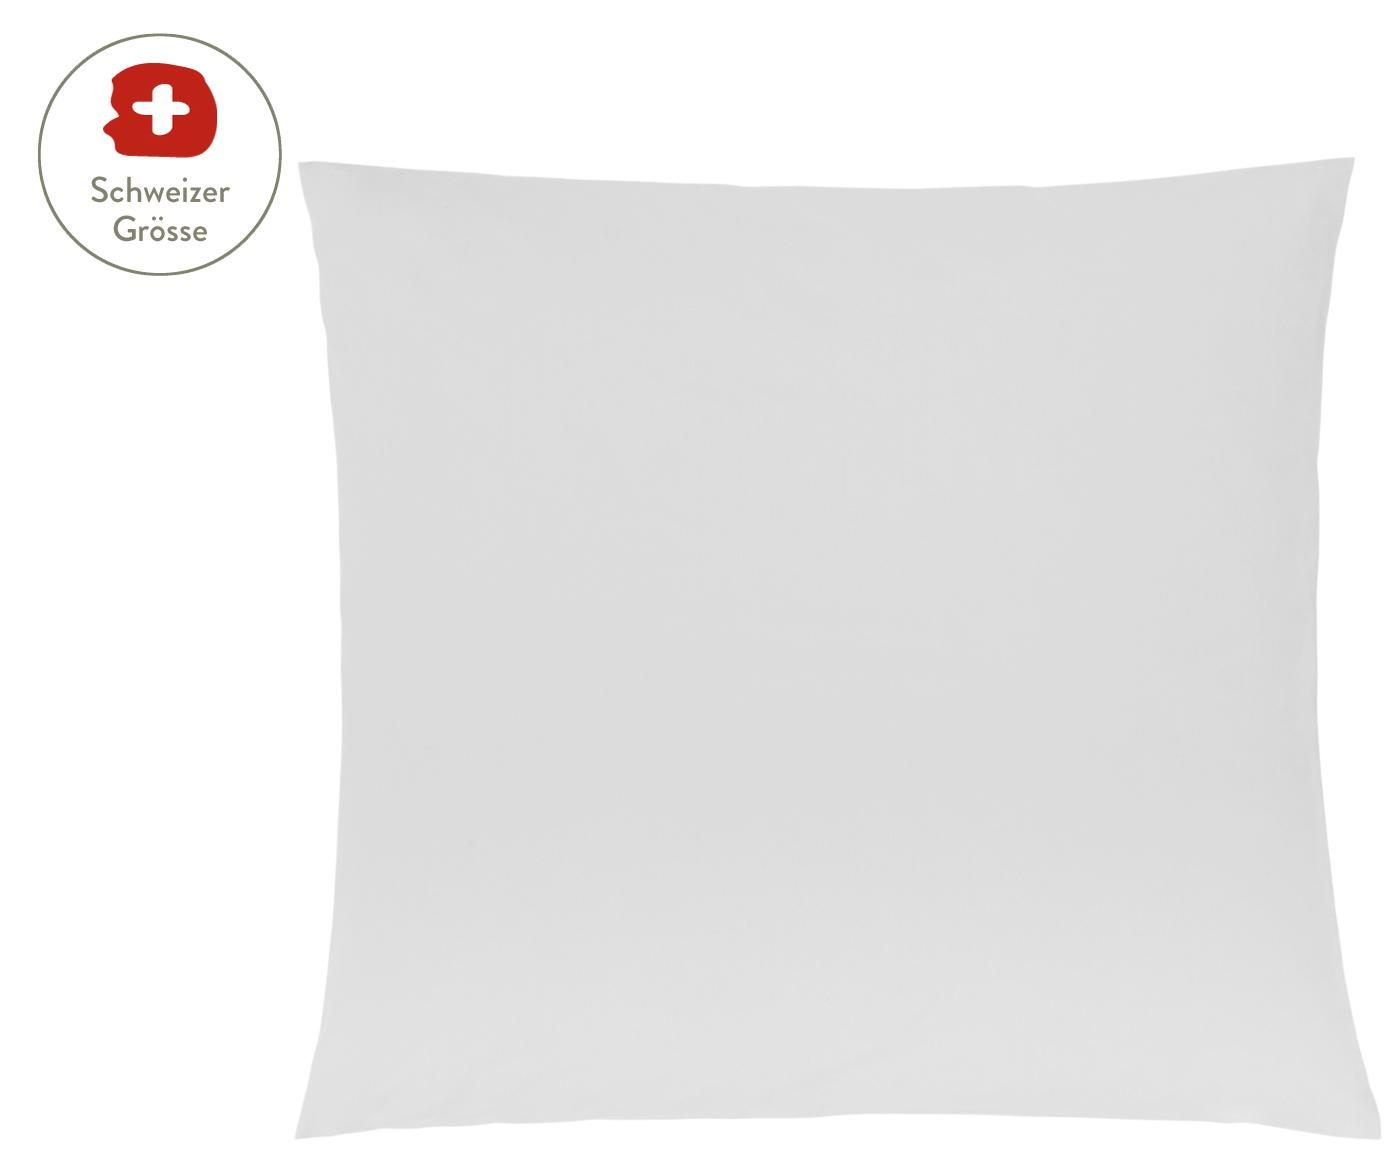 Baumwollperkal-Kissenbezug Elsie in Hellgrau, Webart: Perkal Fadendichte 200 TC, Hellgrau, 65 x 65 cm